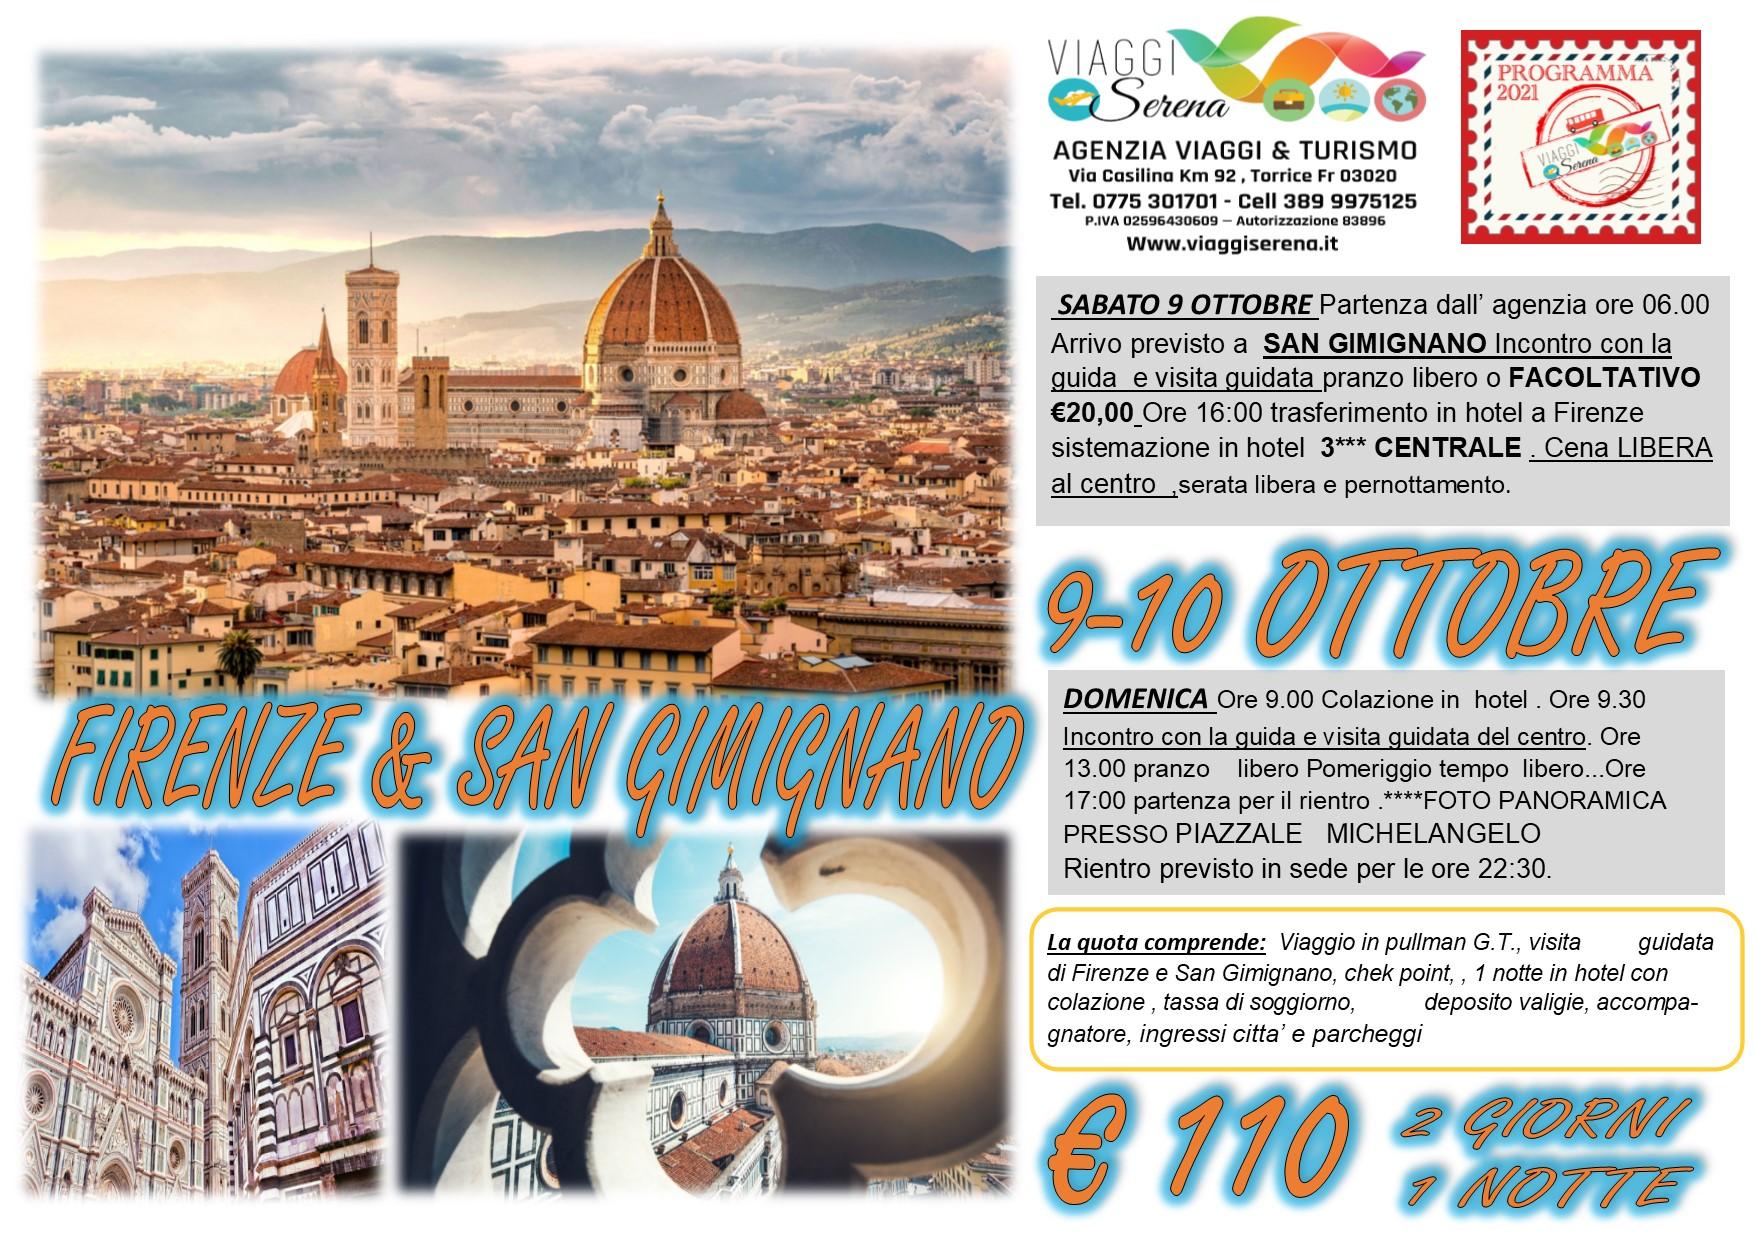 Viaggi di Gruppo: Firenze & San Gimignano 9-10 Ottobre € 110,00